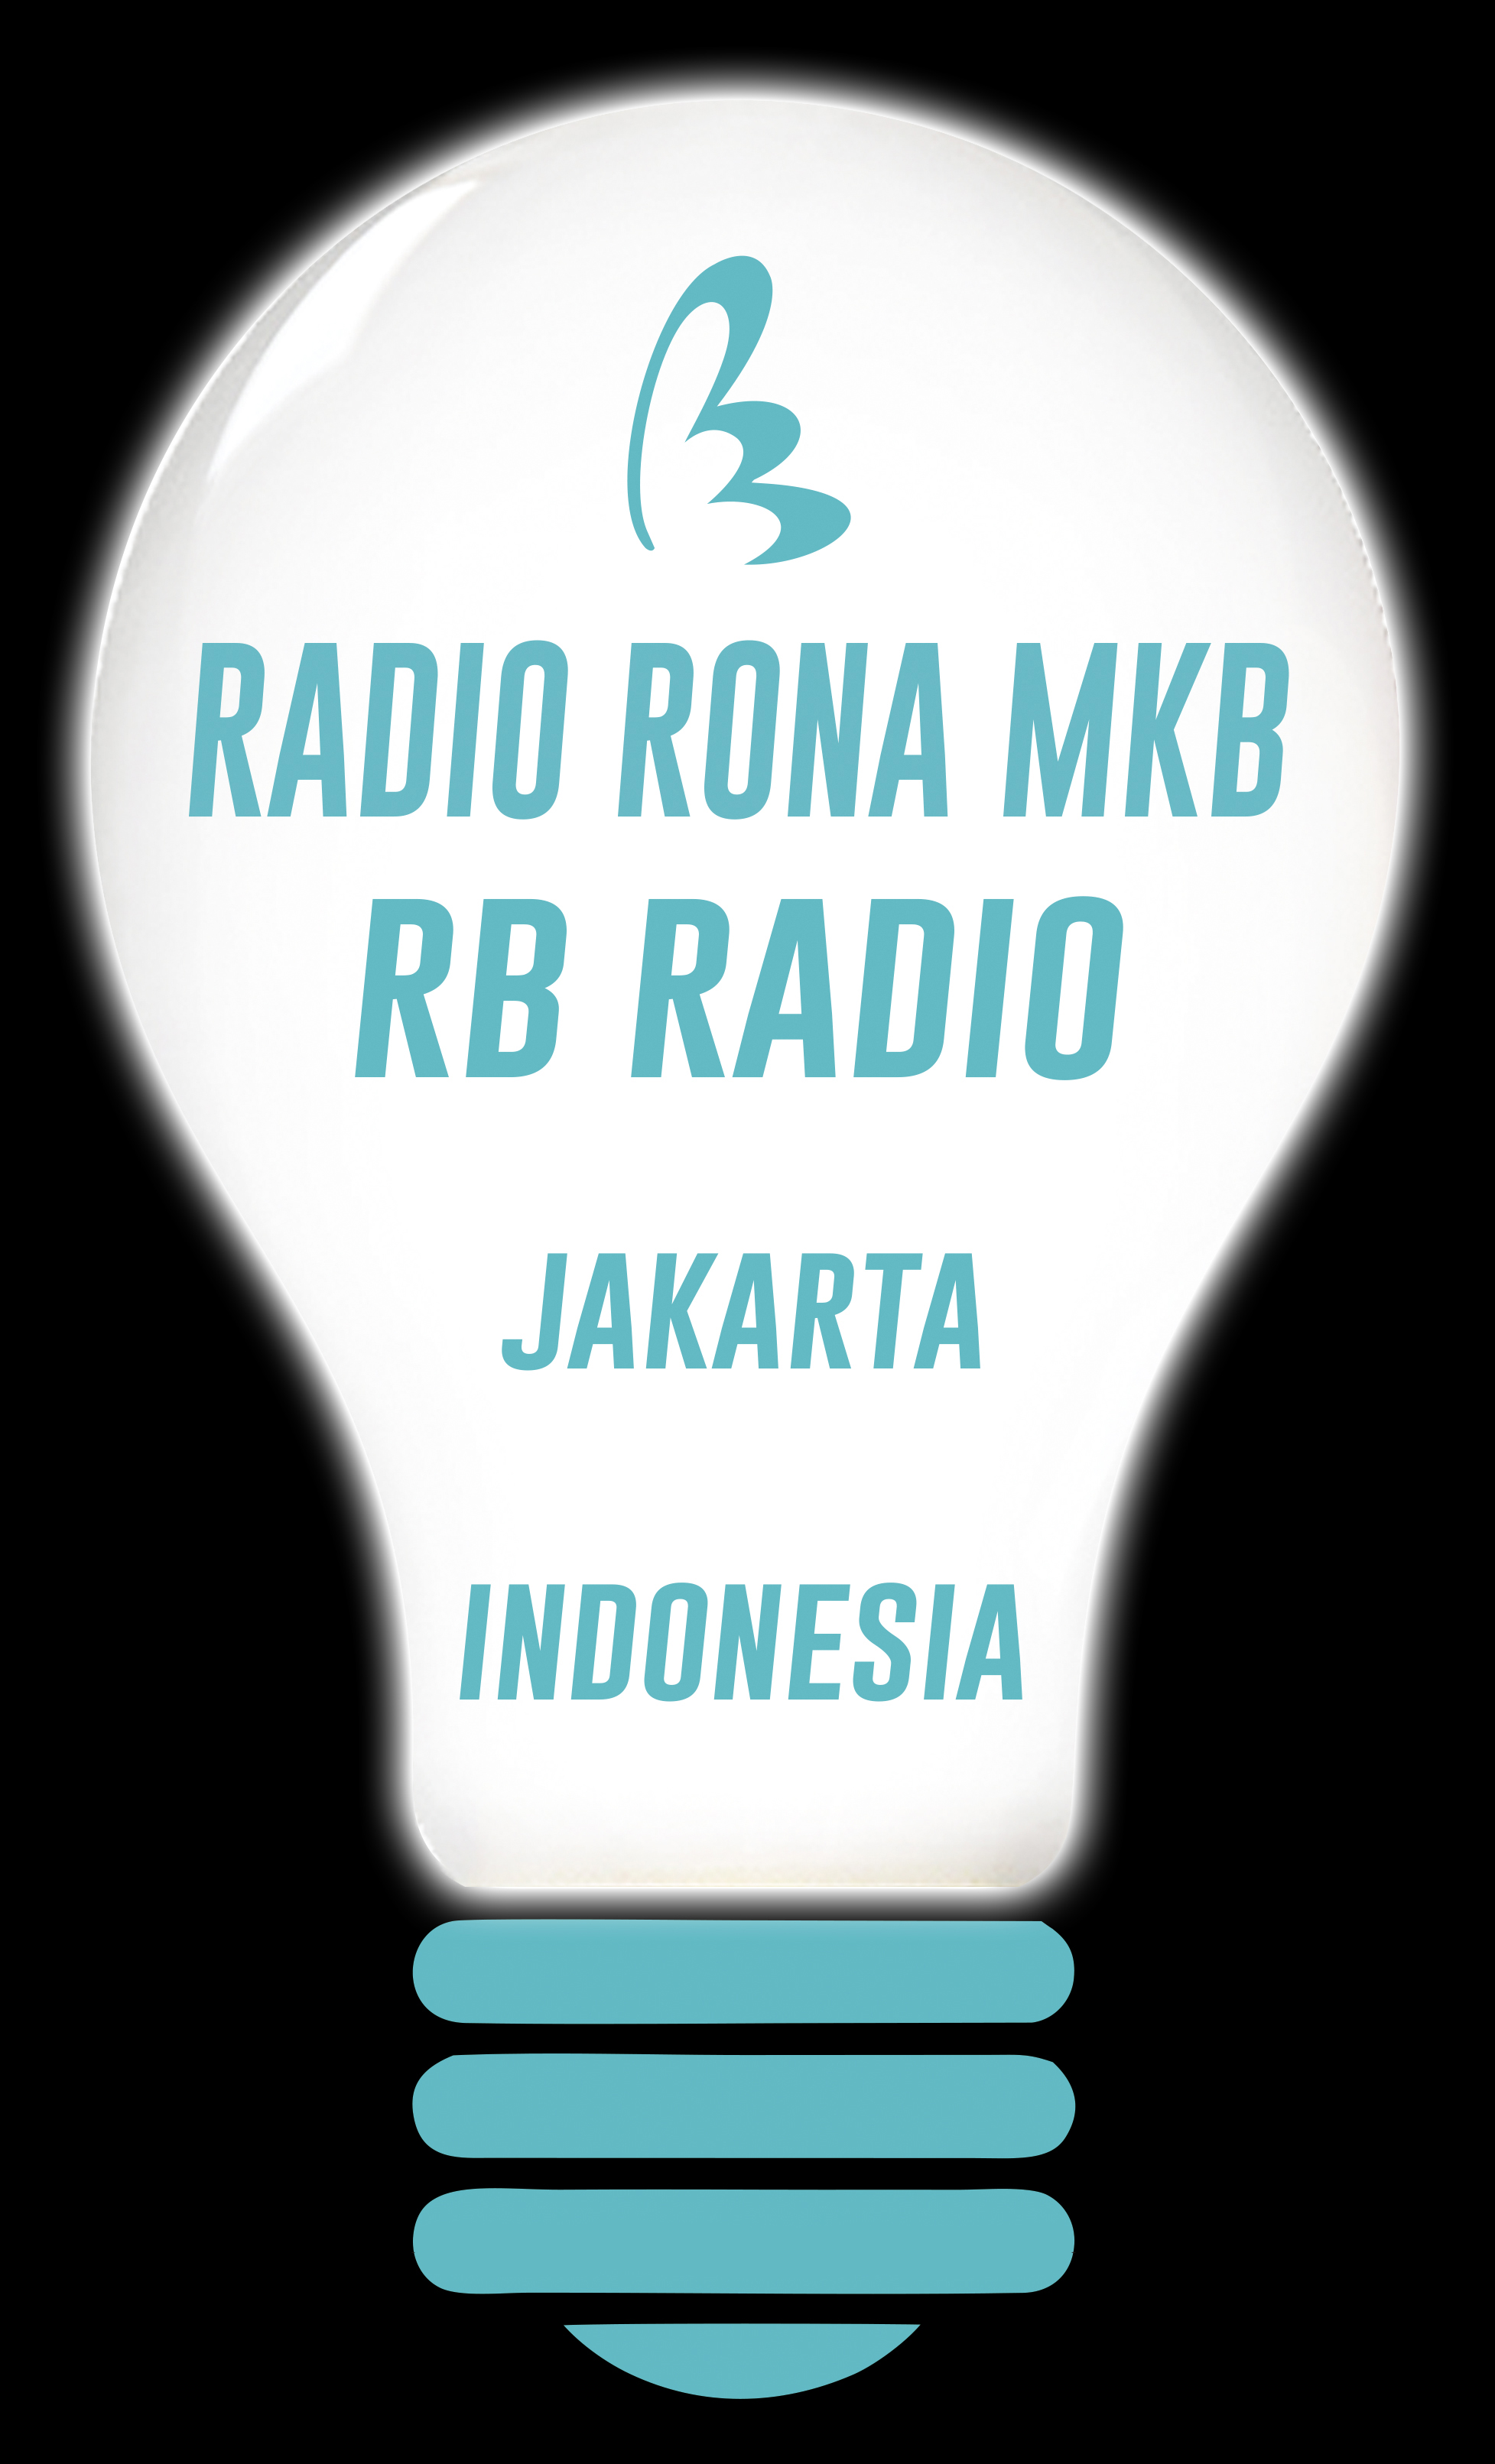 Radio Rona Mkb